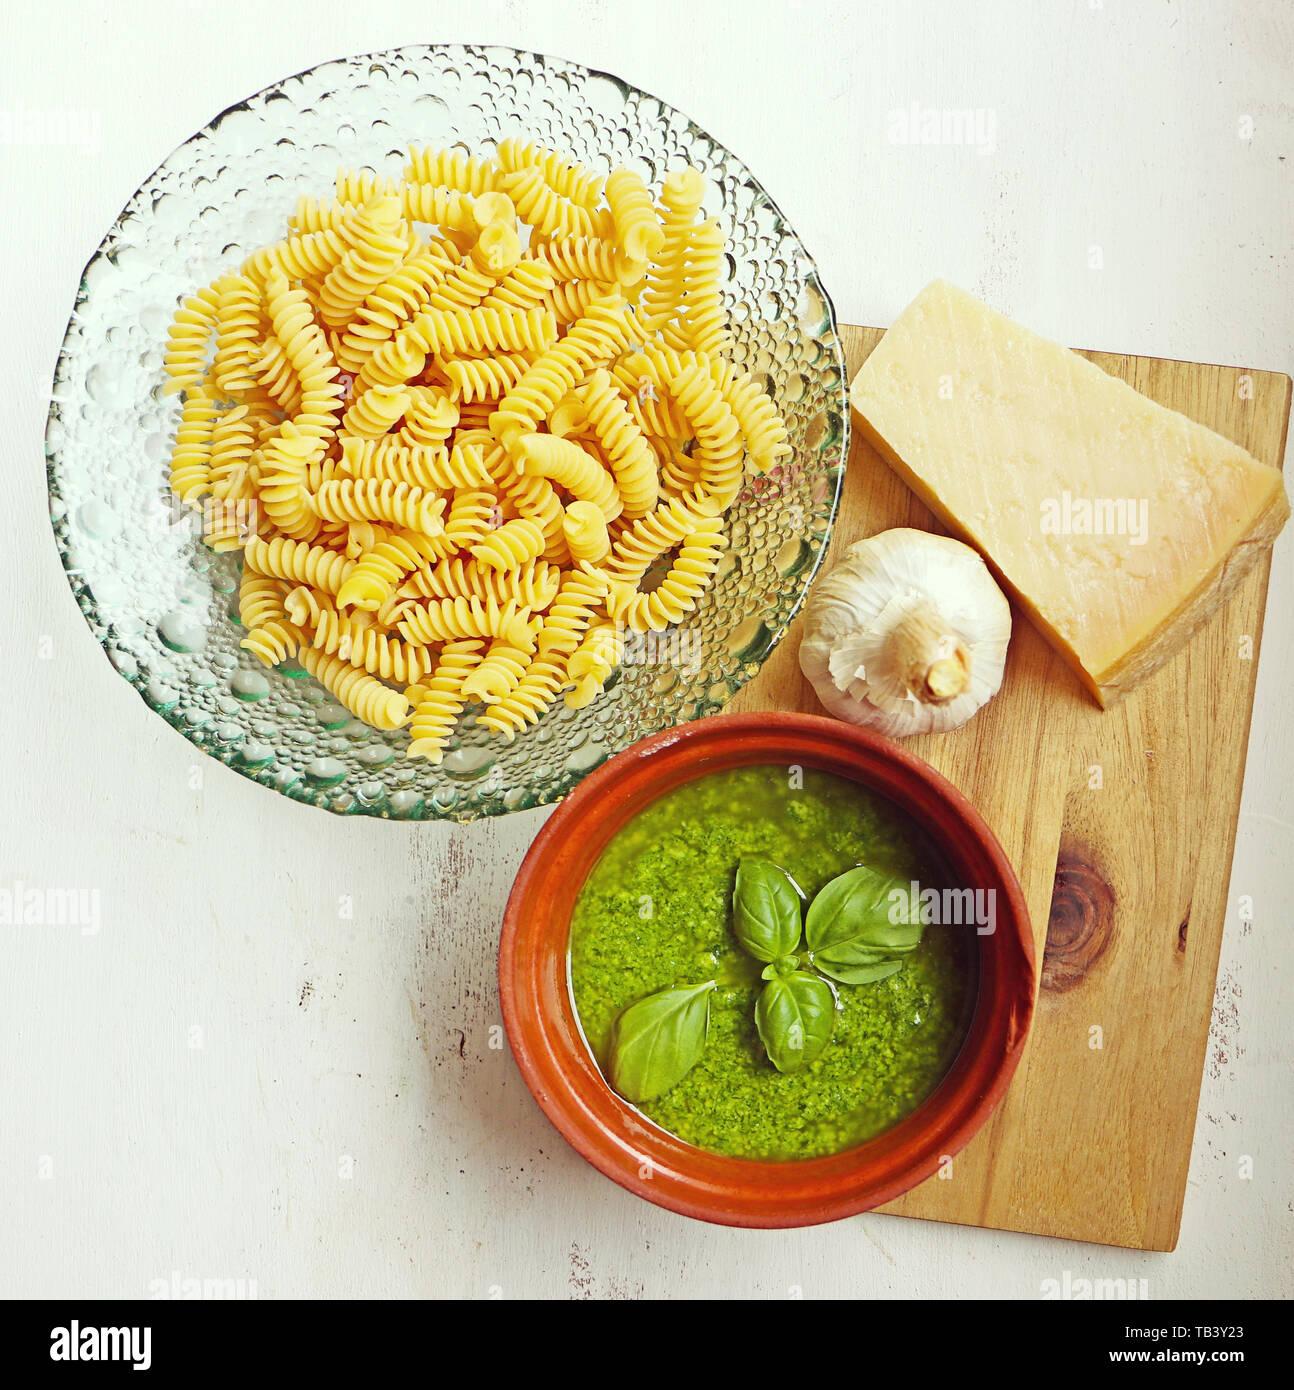 Mediterrane Küche: Pasta Nudeln, Basilikum Pesto Genovese Sauce, Knoblauch und Parmesan Stockfoto